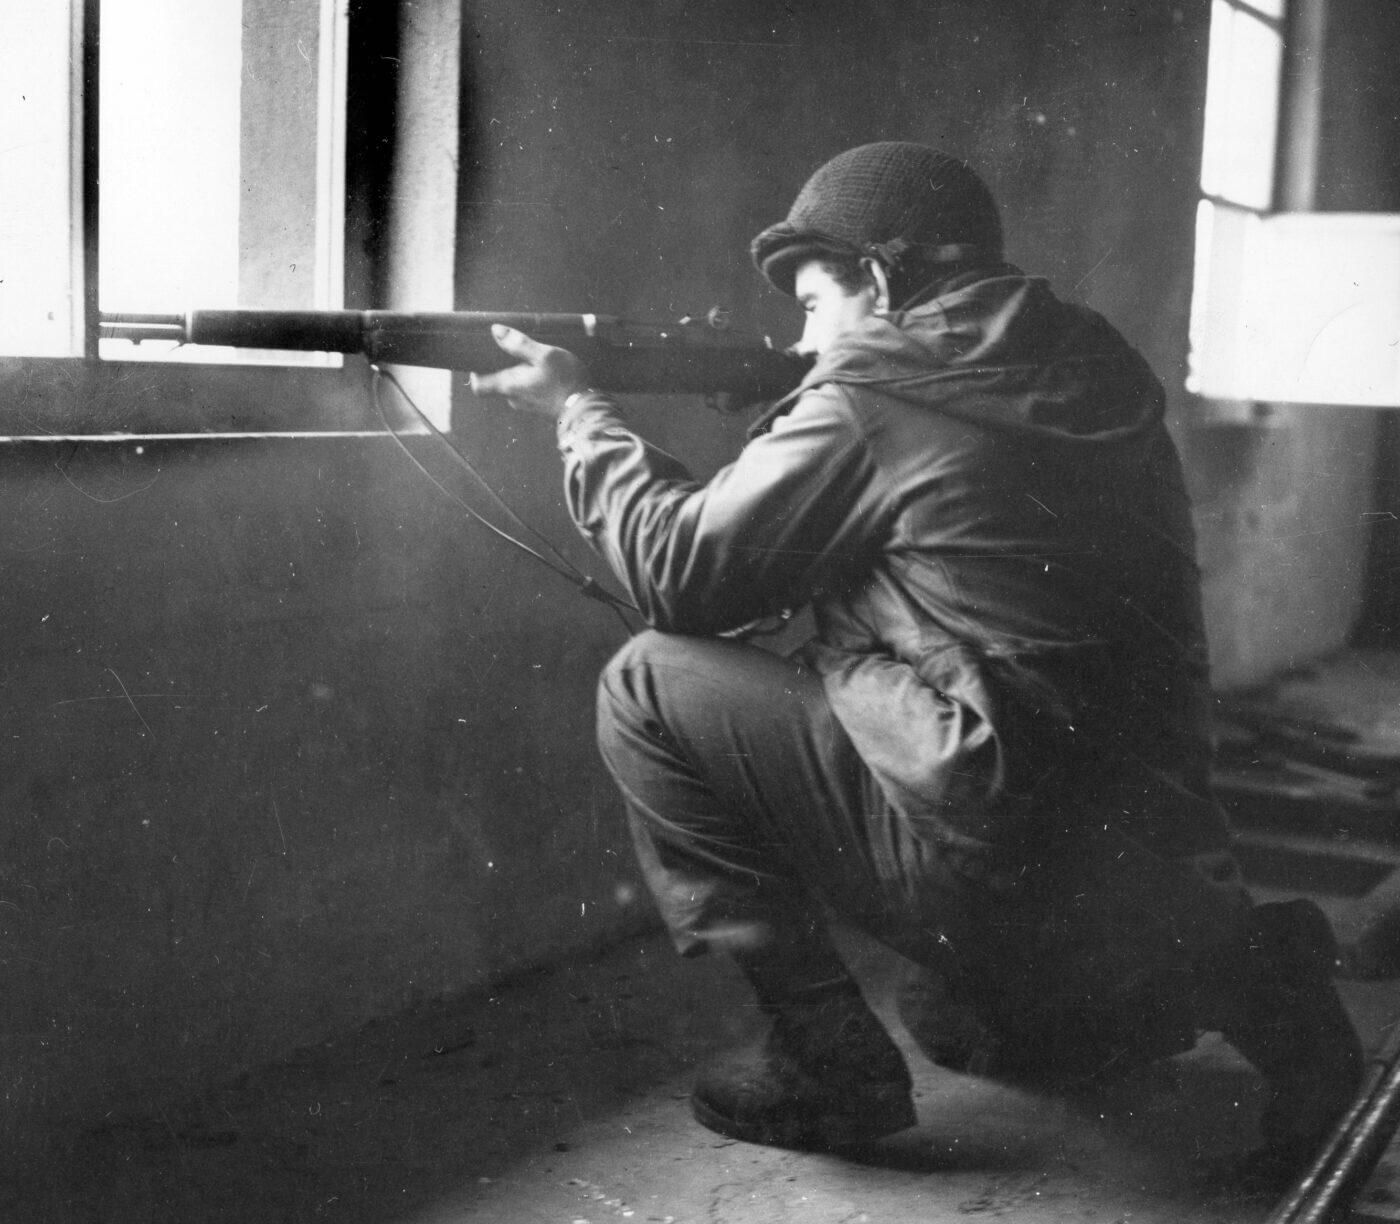 M1 Garand sniper rifle